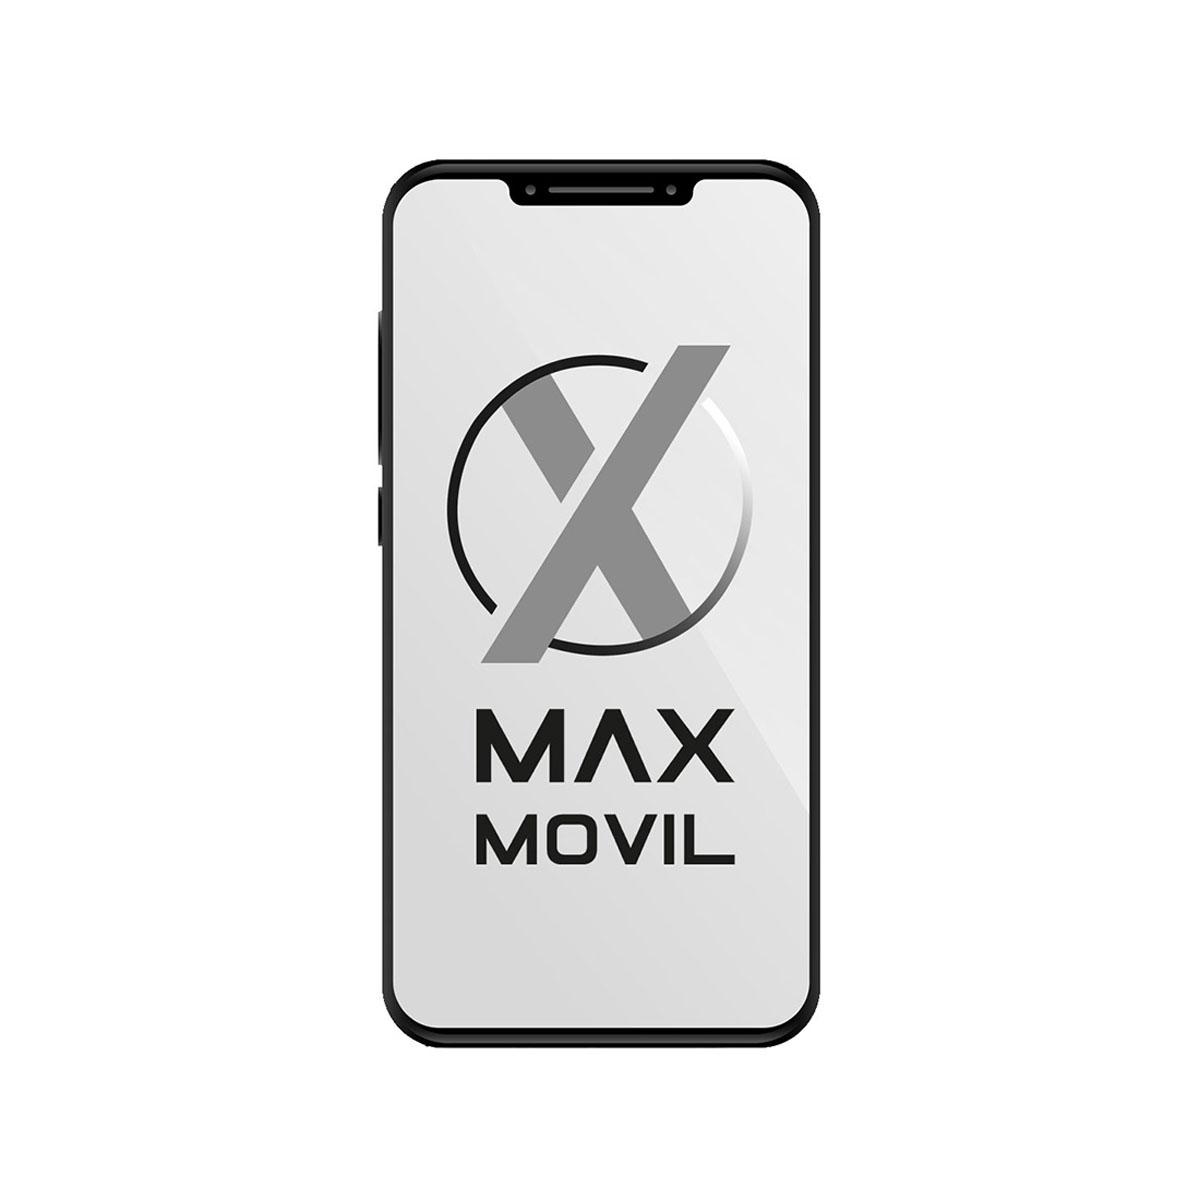 Telefono Dect Alcatel F680 Teclas Grandes 3 Memorias directas Gran Pantalla retroiluminada M/Libres 5 Niveles de volumen